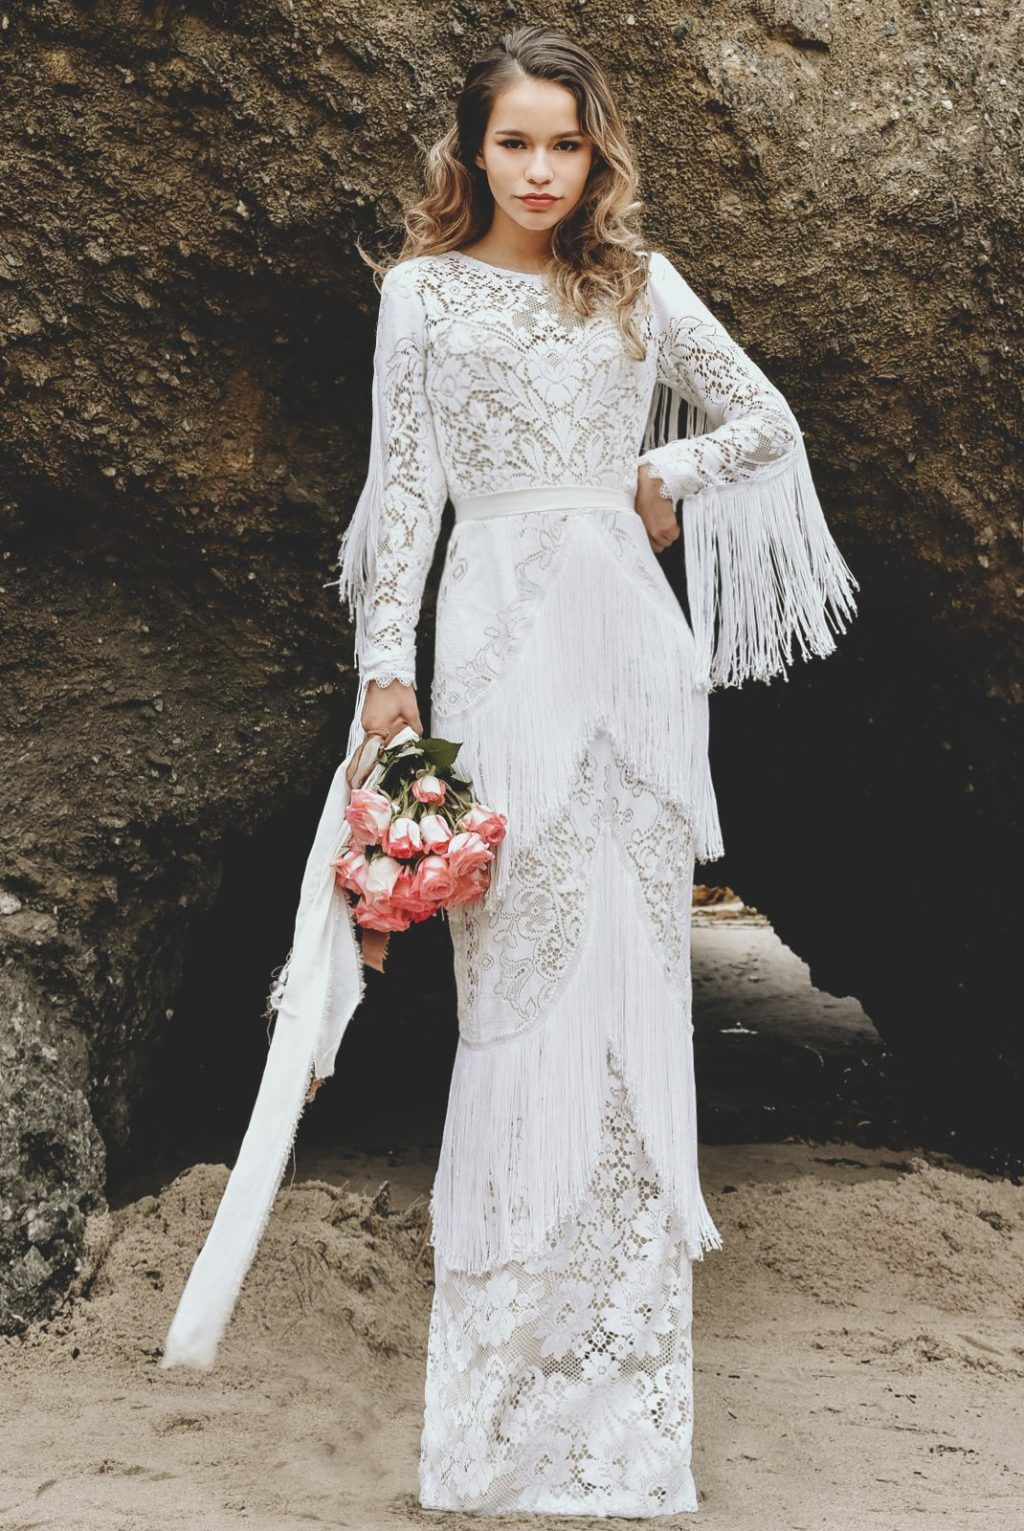 30 Effortlessly Beautiful Boho Wedding Dresses One Fab Day In 2020 Boho Wedding Dress Dresses Boho Gown,Cute Cheap Wedding Dresses